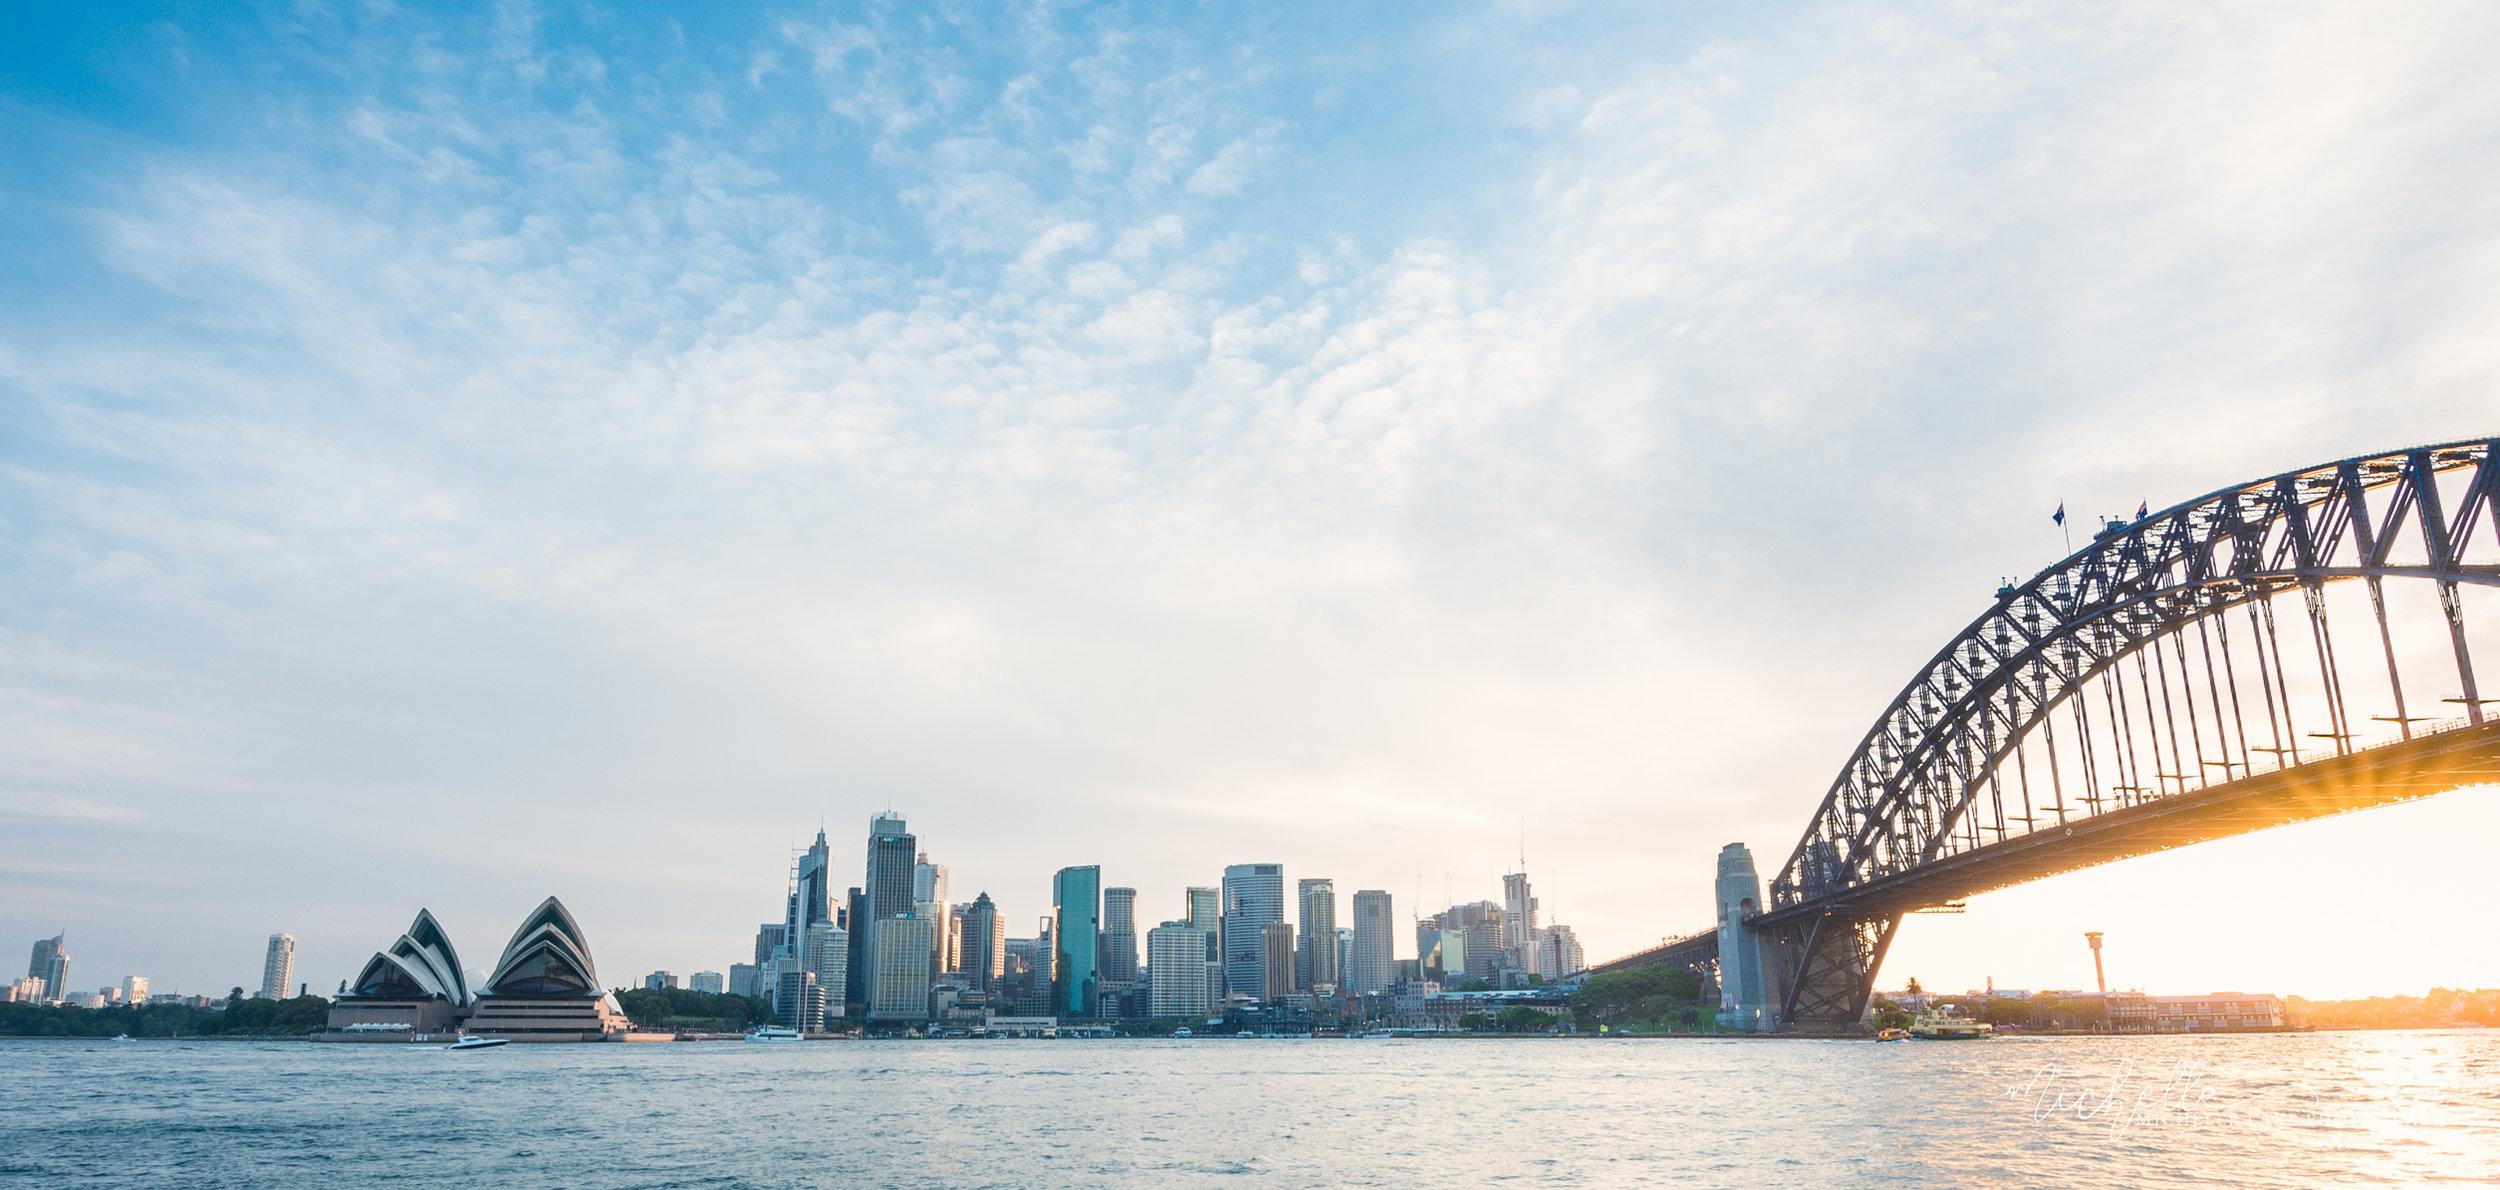 Sydney harbour skyline at sunset, NSW